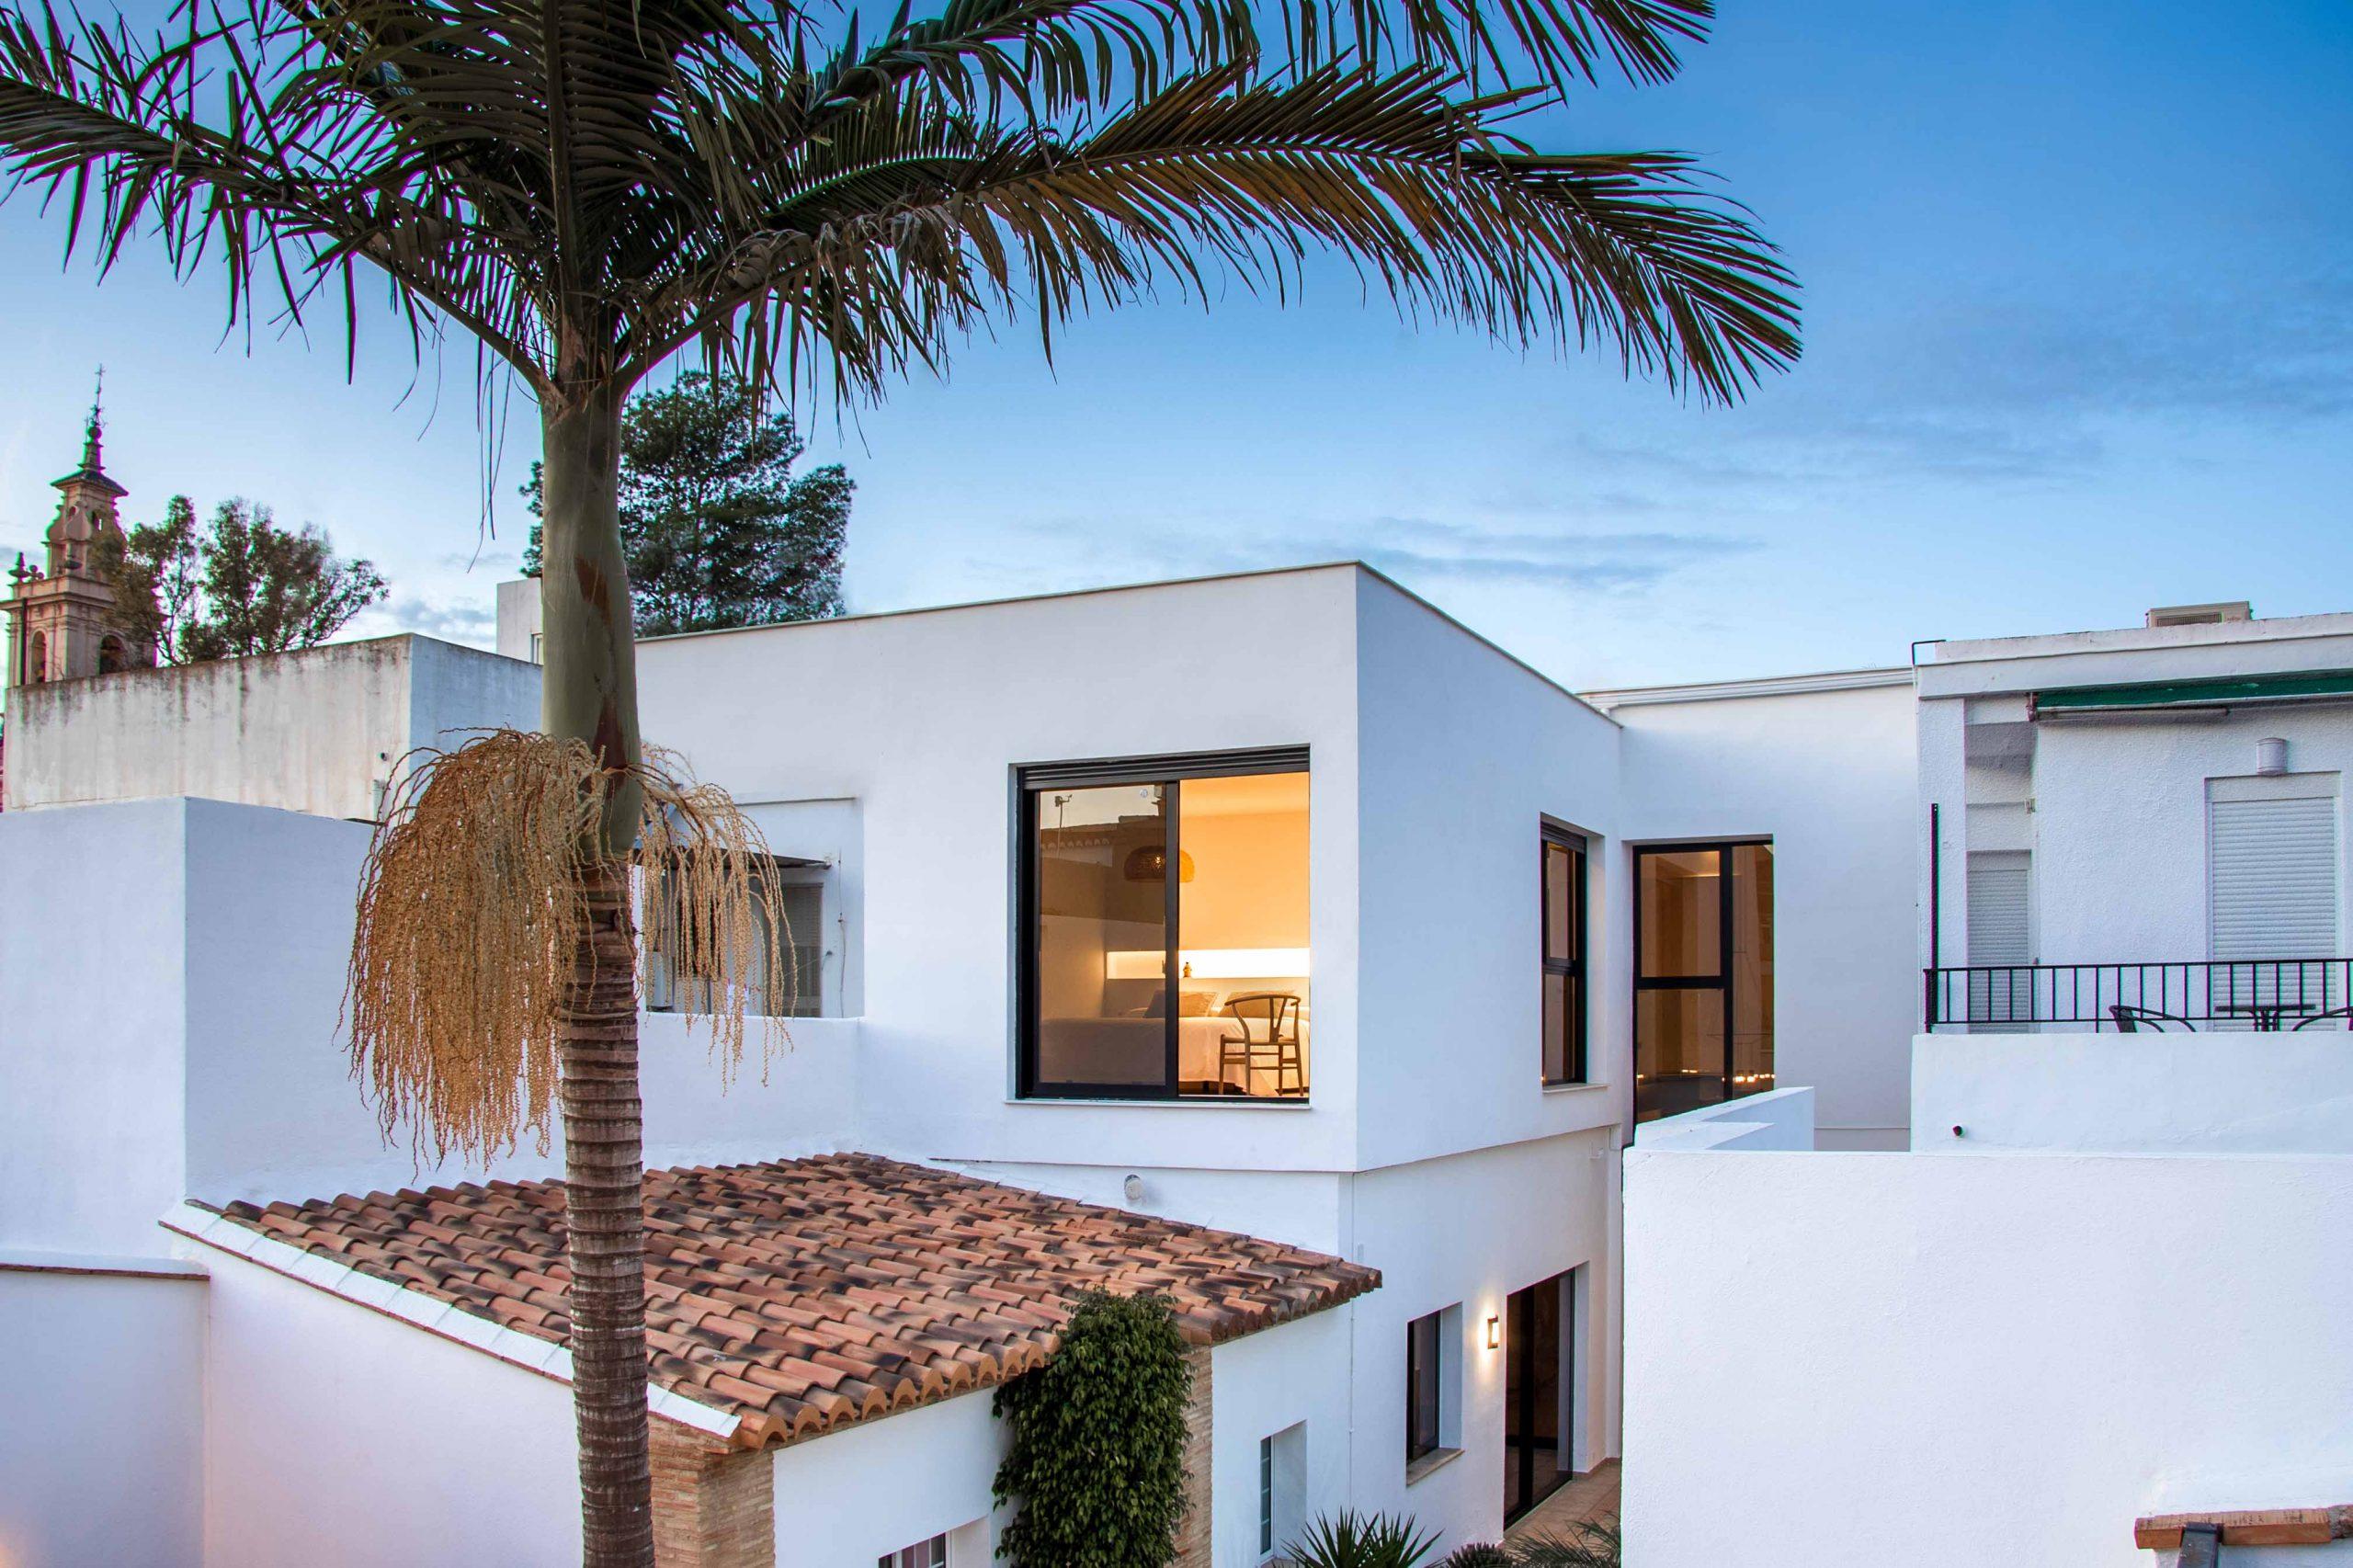 Palmera-Chiralt-Arquitectos-Valencia-18